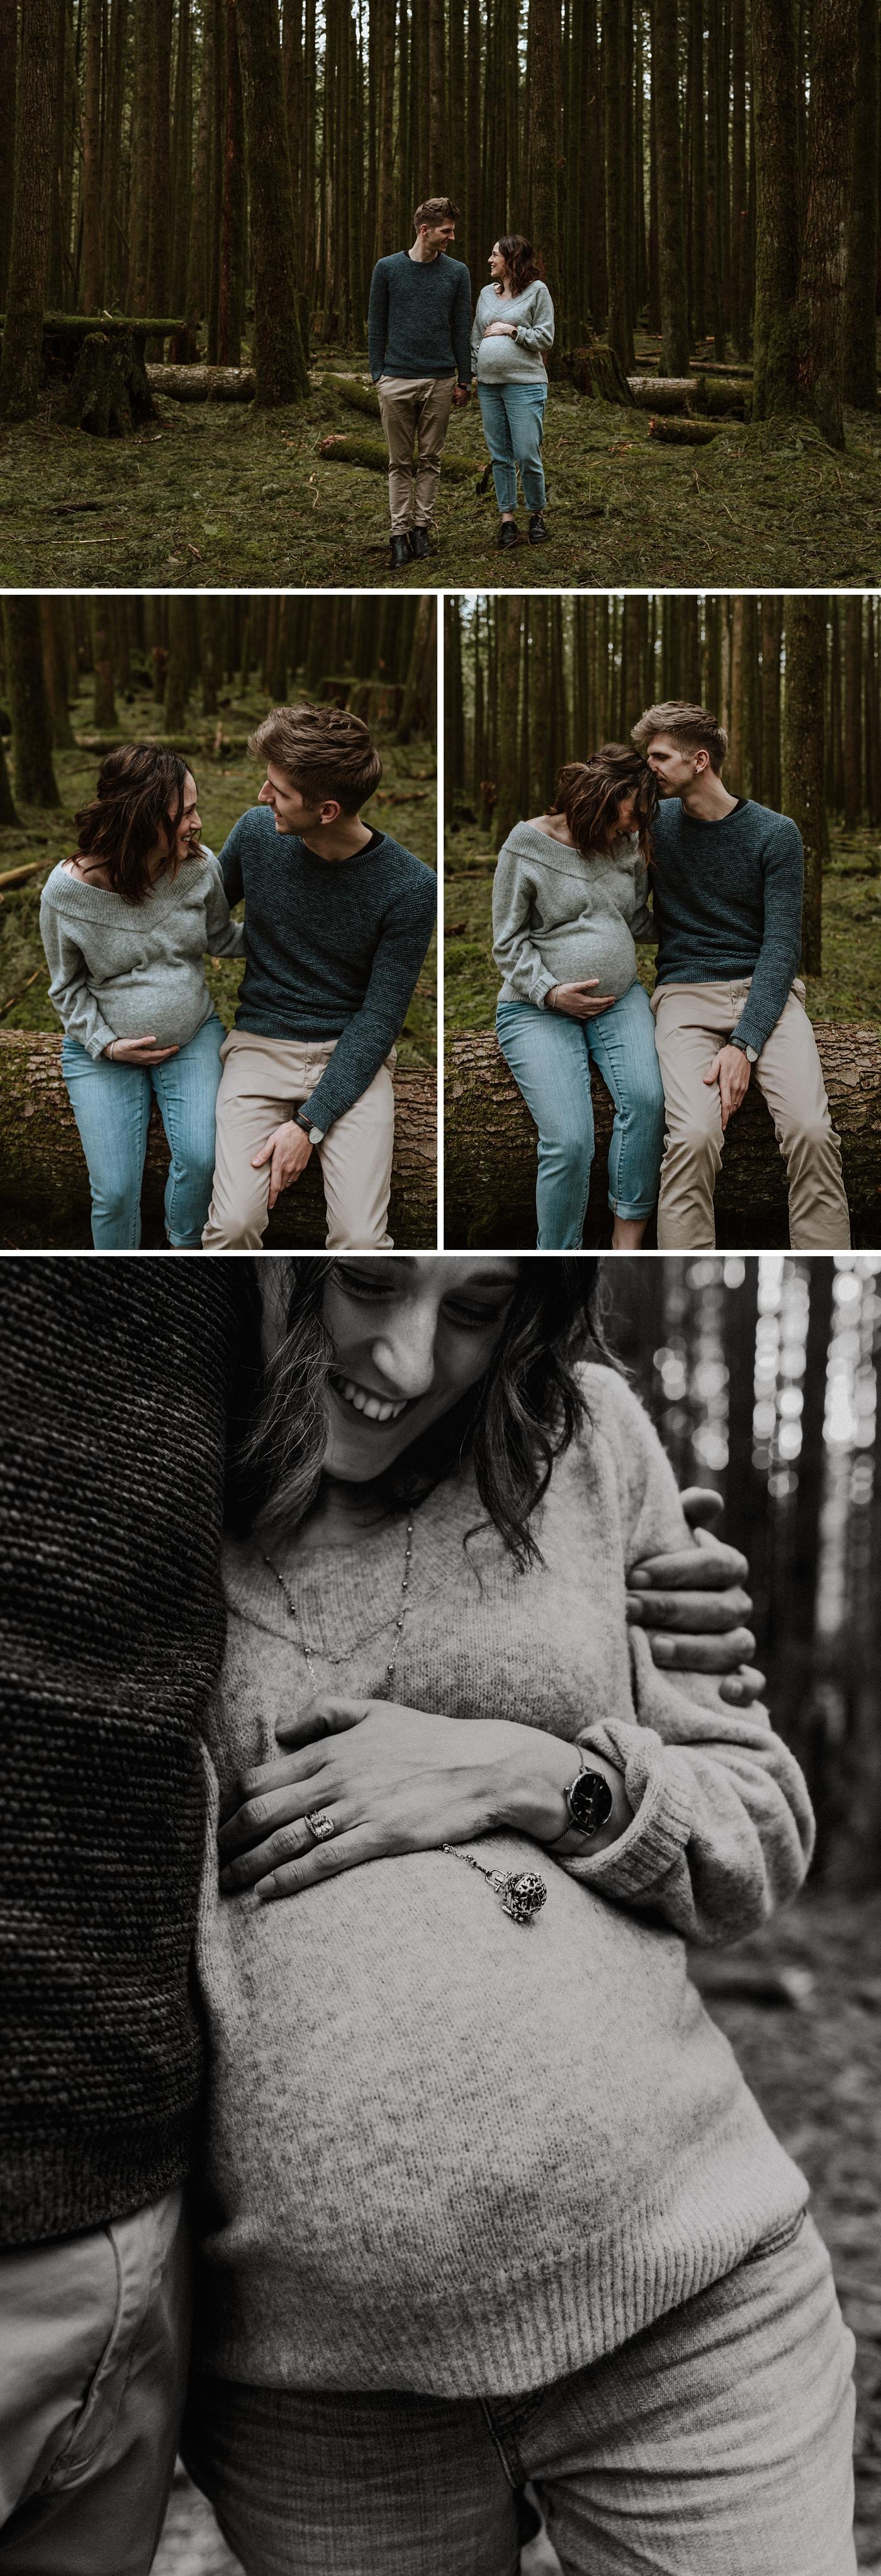 Maple-Ridge-Romantic-Wilderness-Maternity-Photography_0001.jpg